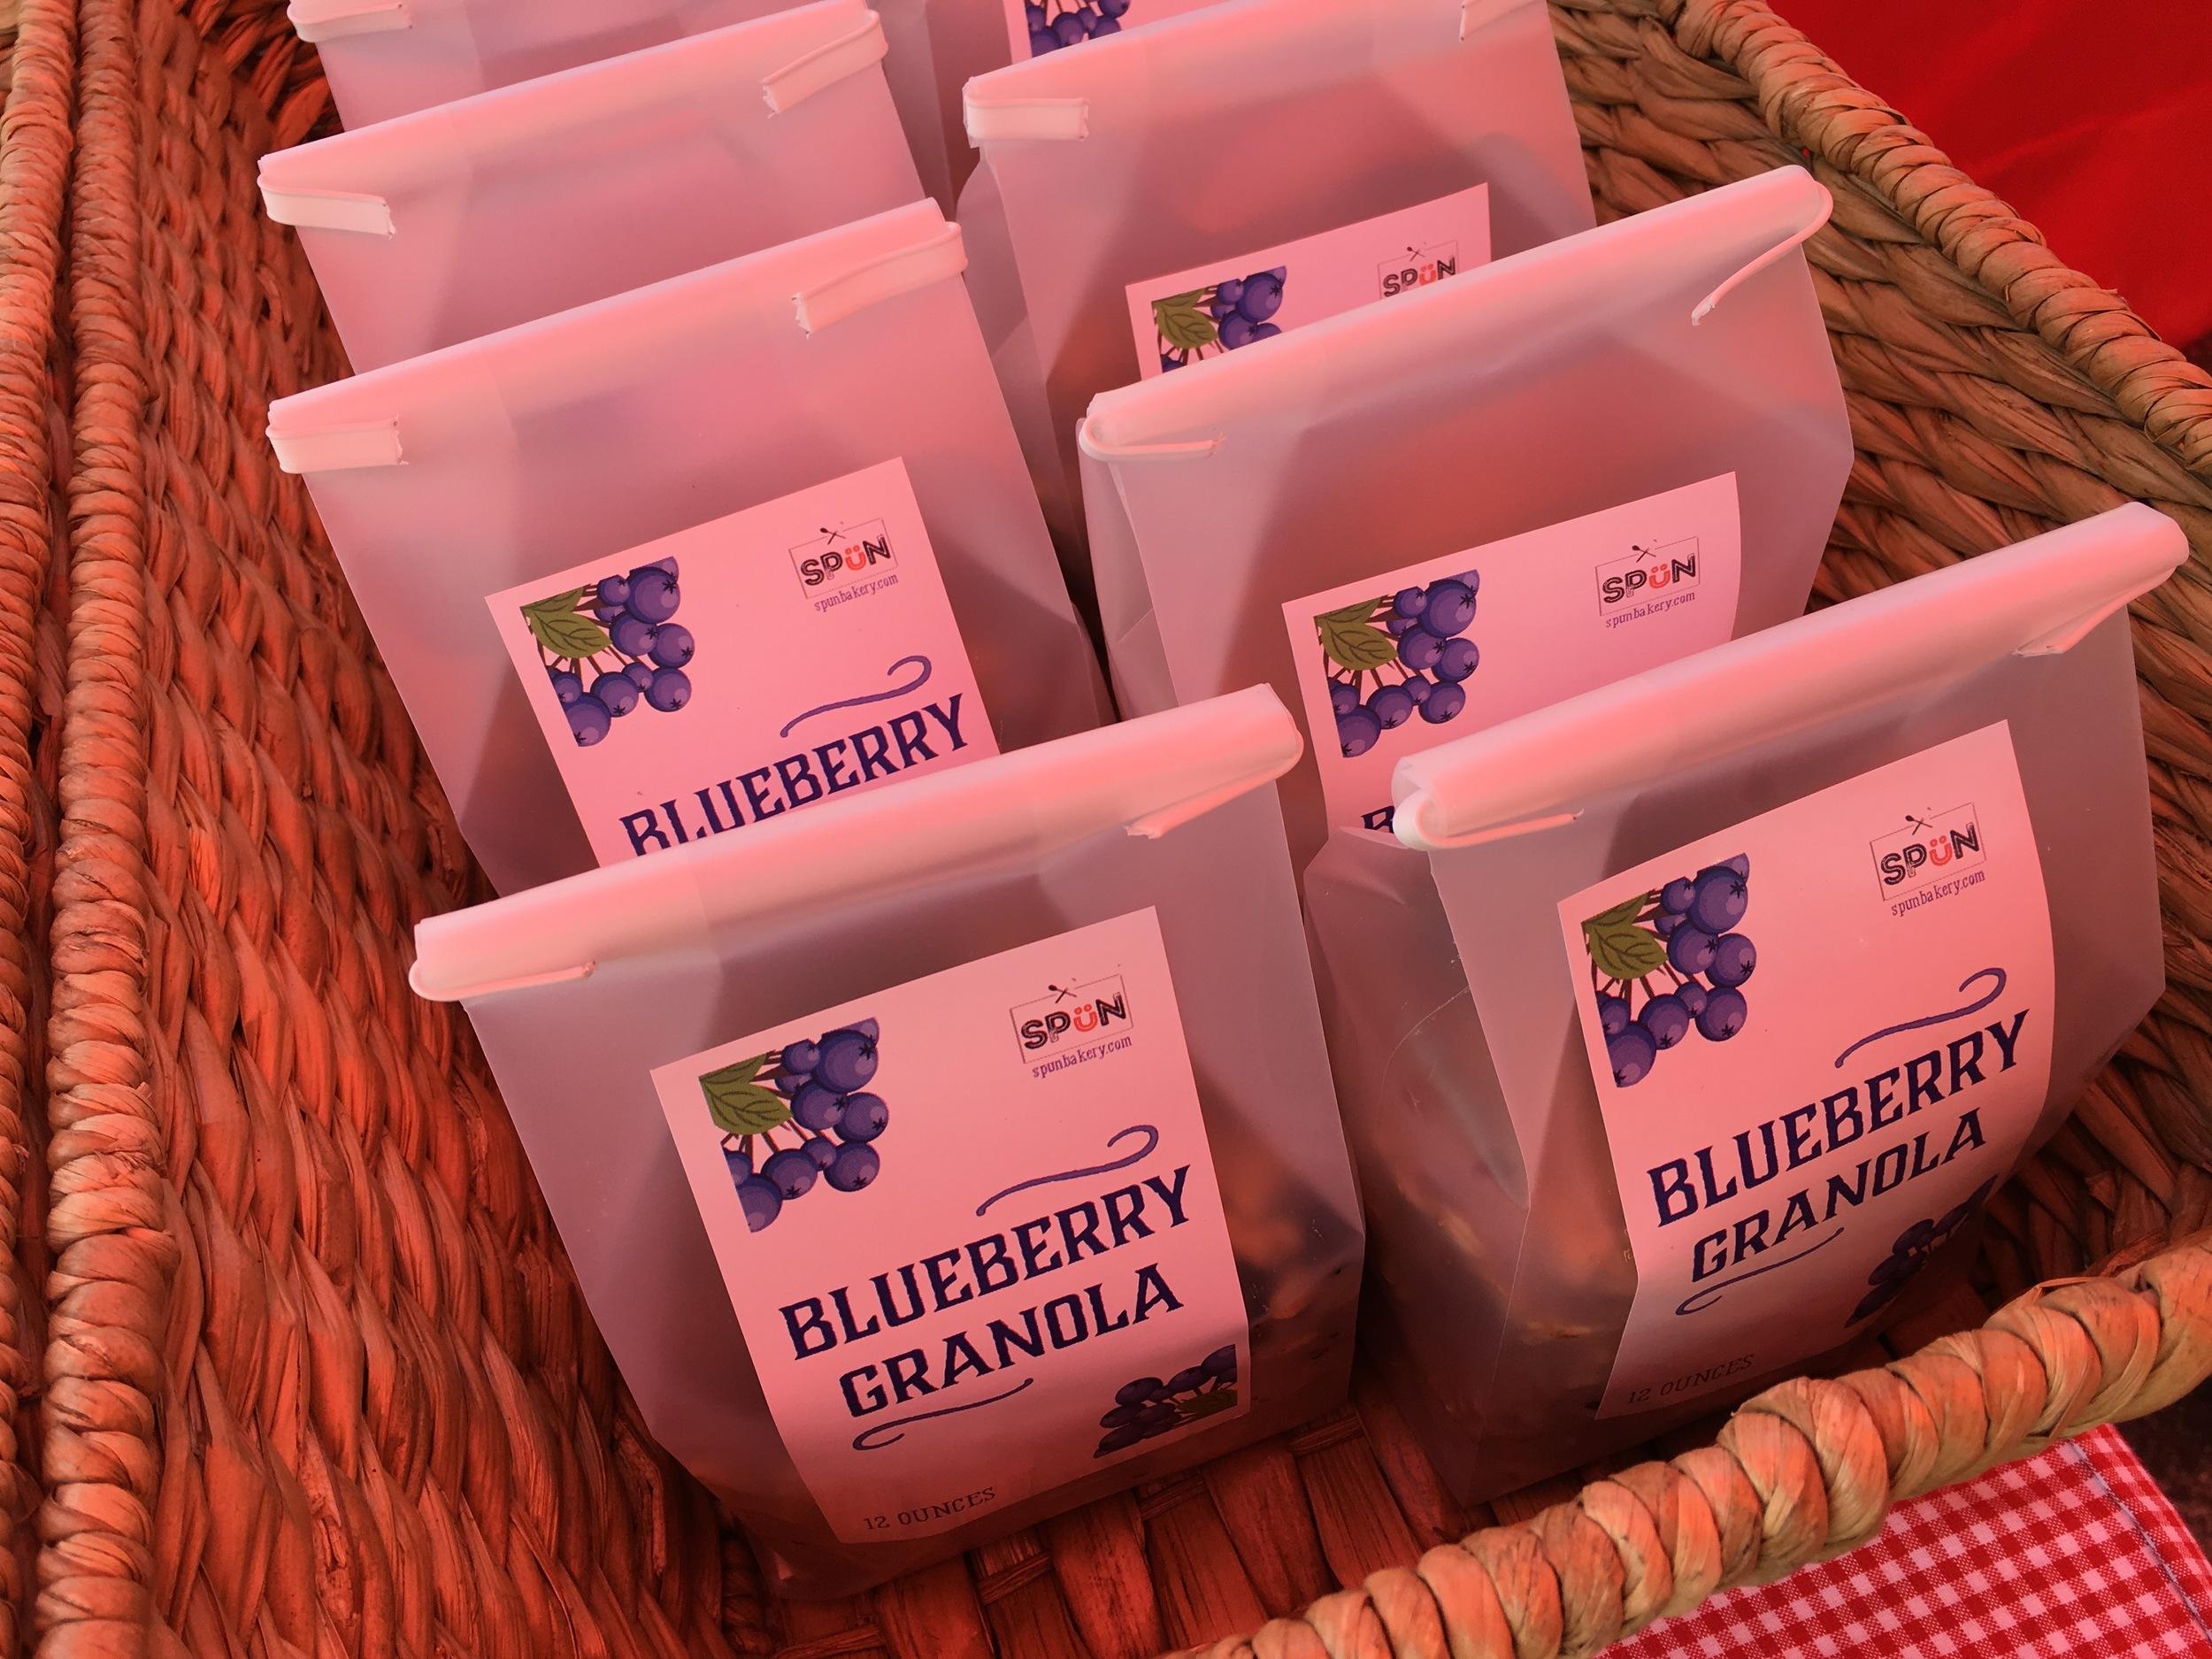 blueberry granola.jpg